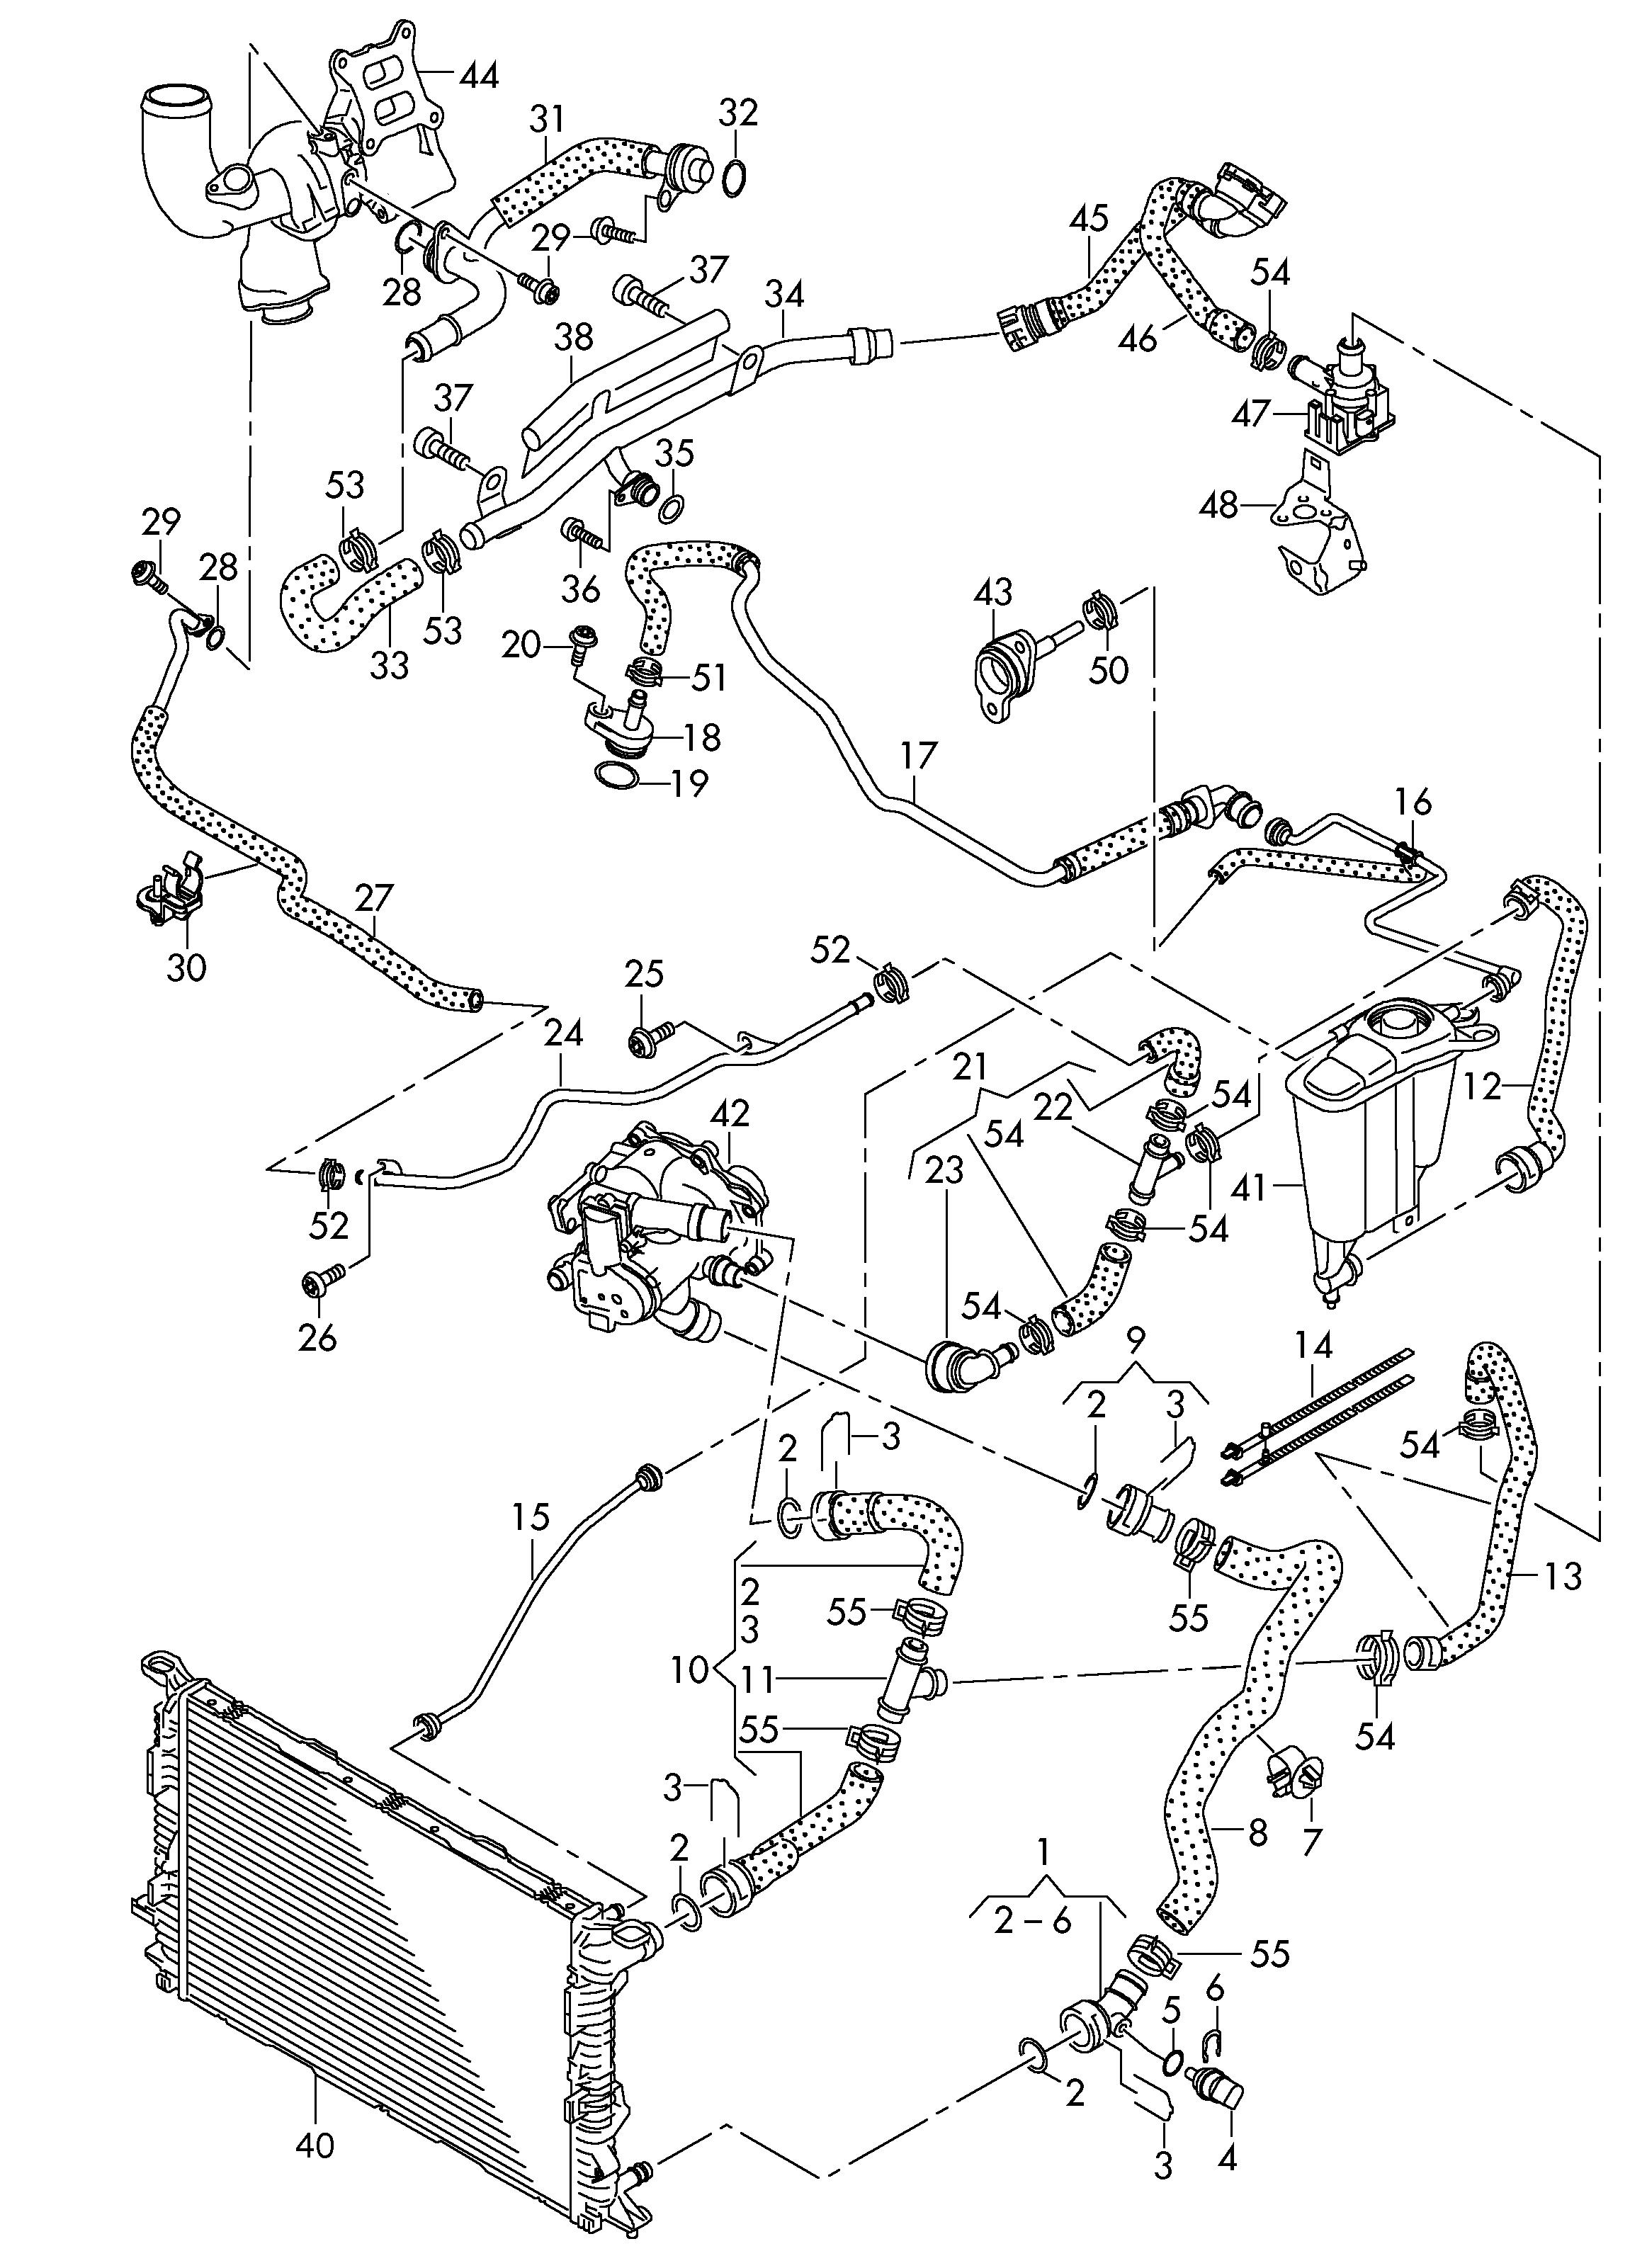 audi q5 engine diagram - wiring diagram schema love-concept -  love-concept.atmosphereconcept.it  atmosphereconcept.it